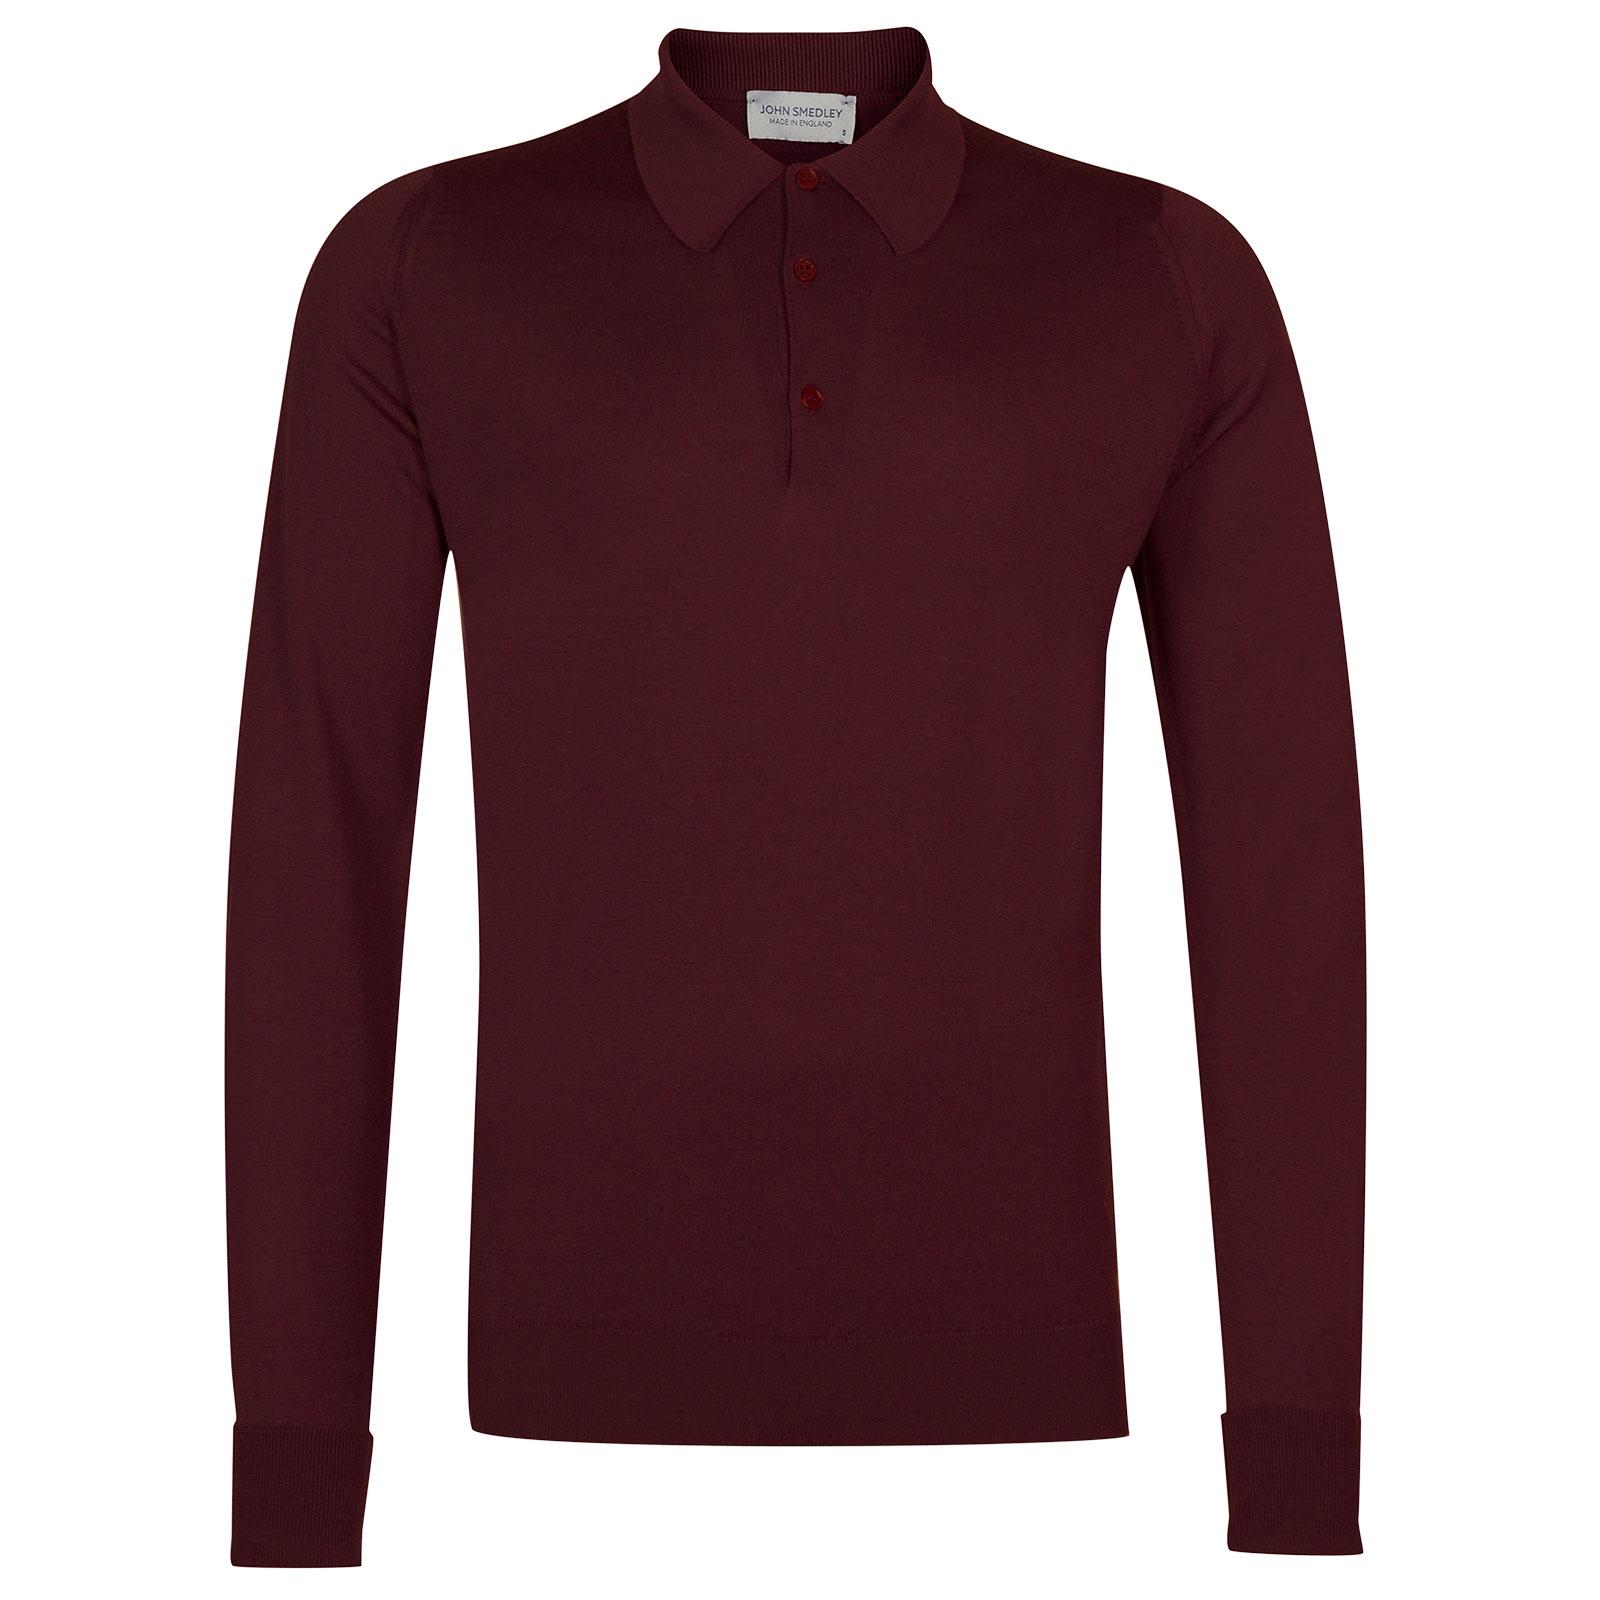 John Smedley Dorset Merino Wool Shirt in Bordeaux-S